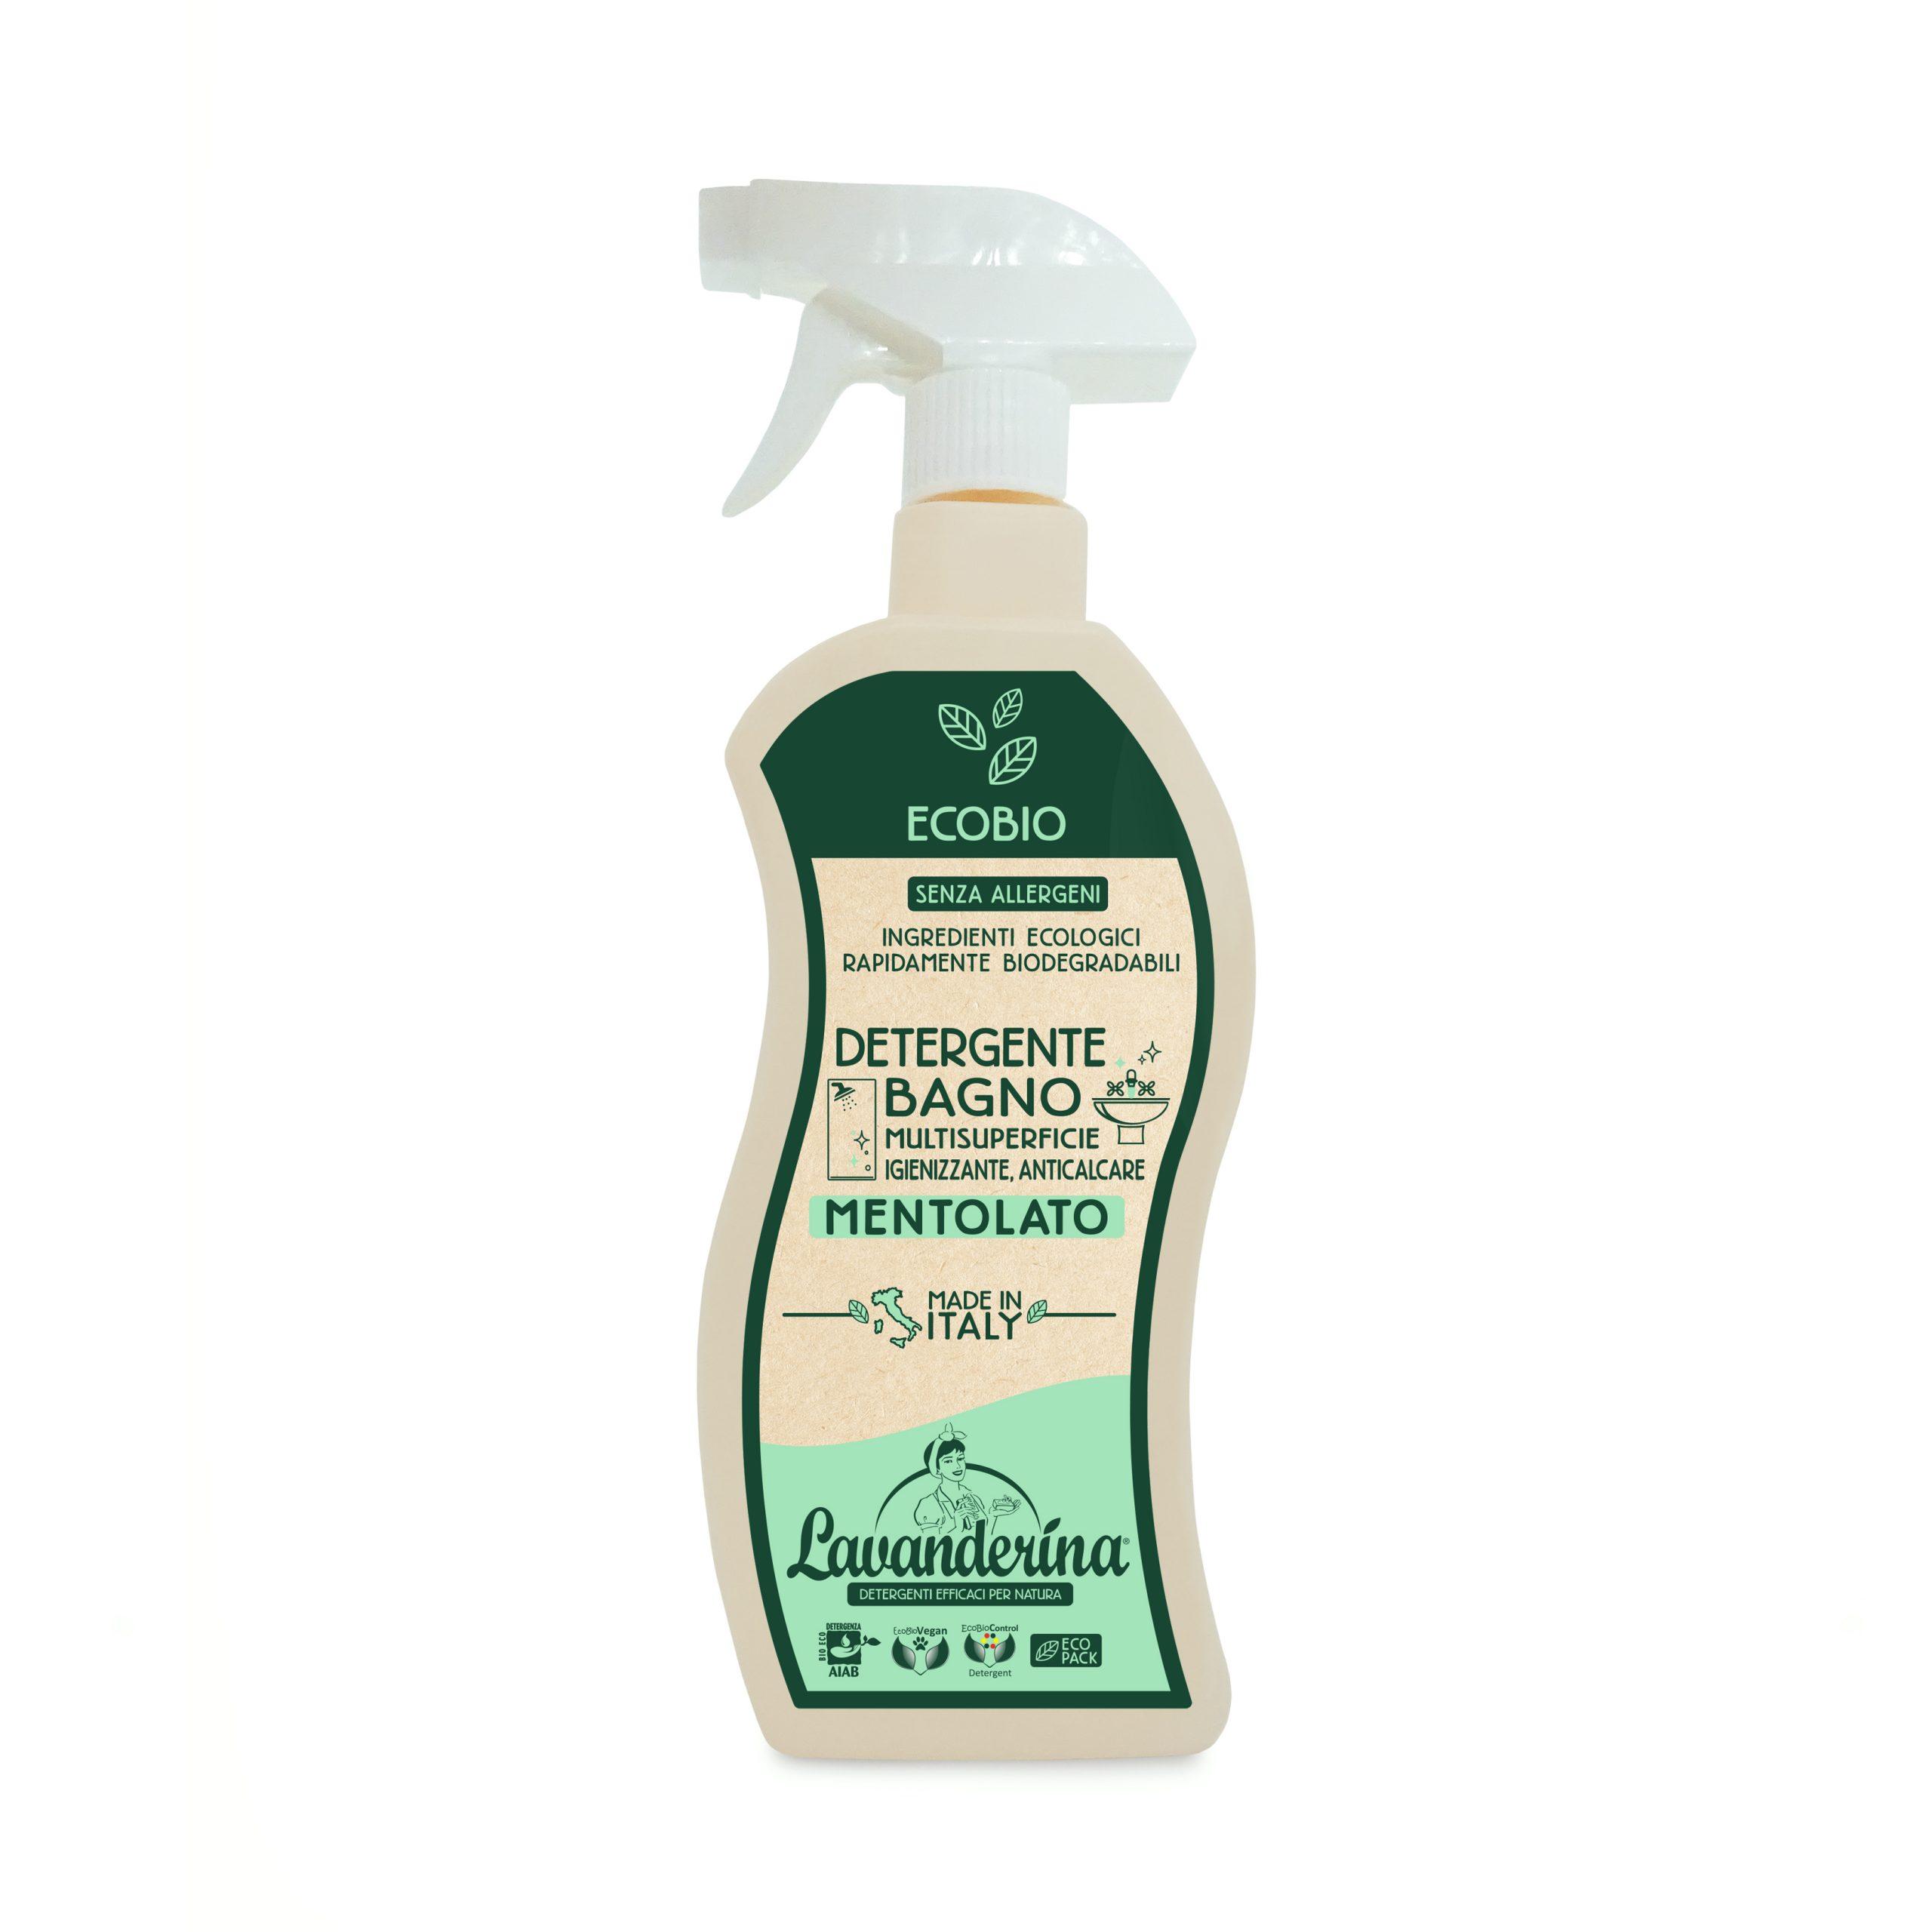 Detergente Bagno Multisuperficie 650mL